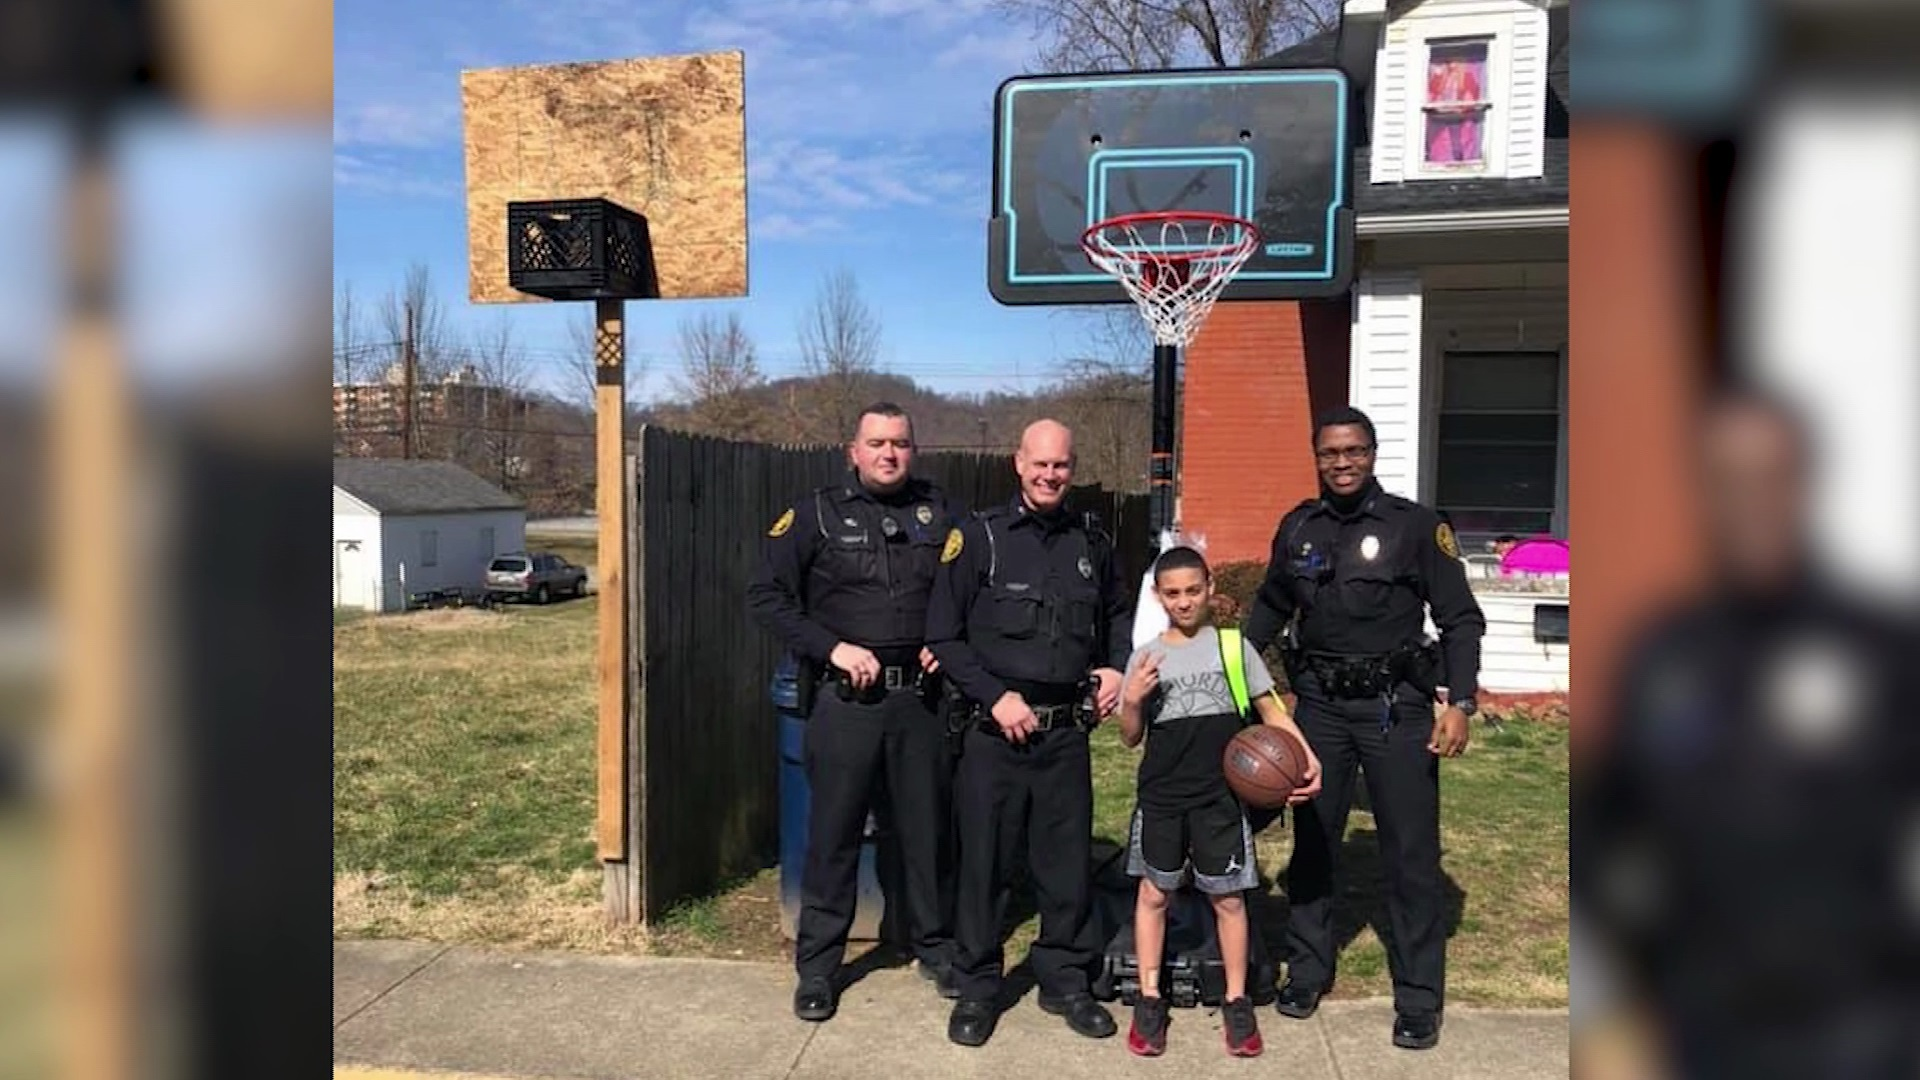 Ashland Police Help Get Local Boy New Basketball Hoop